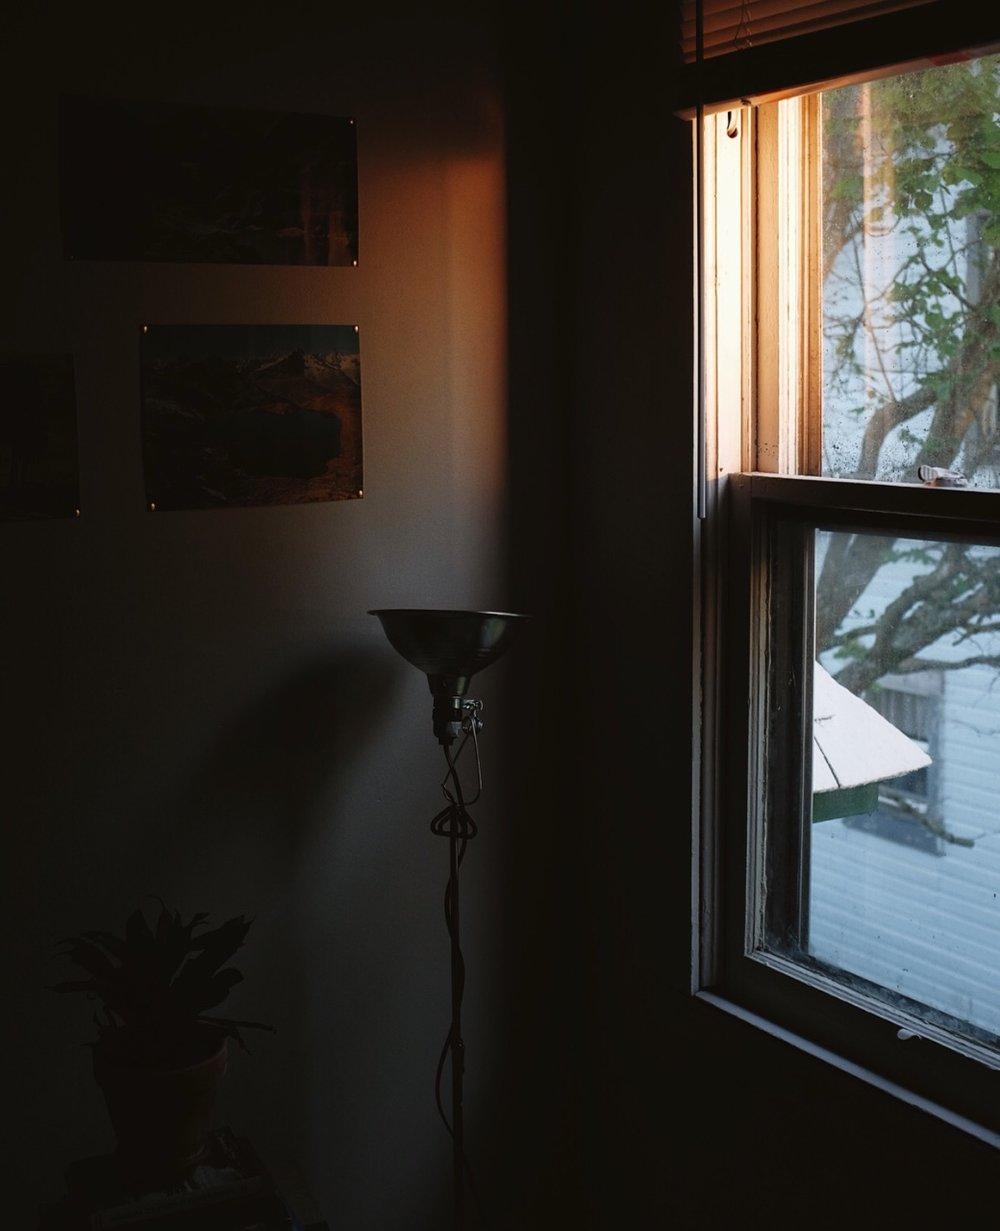 6:29a